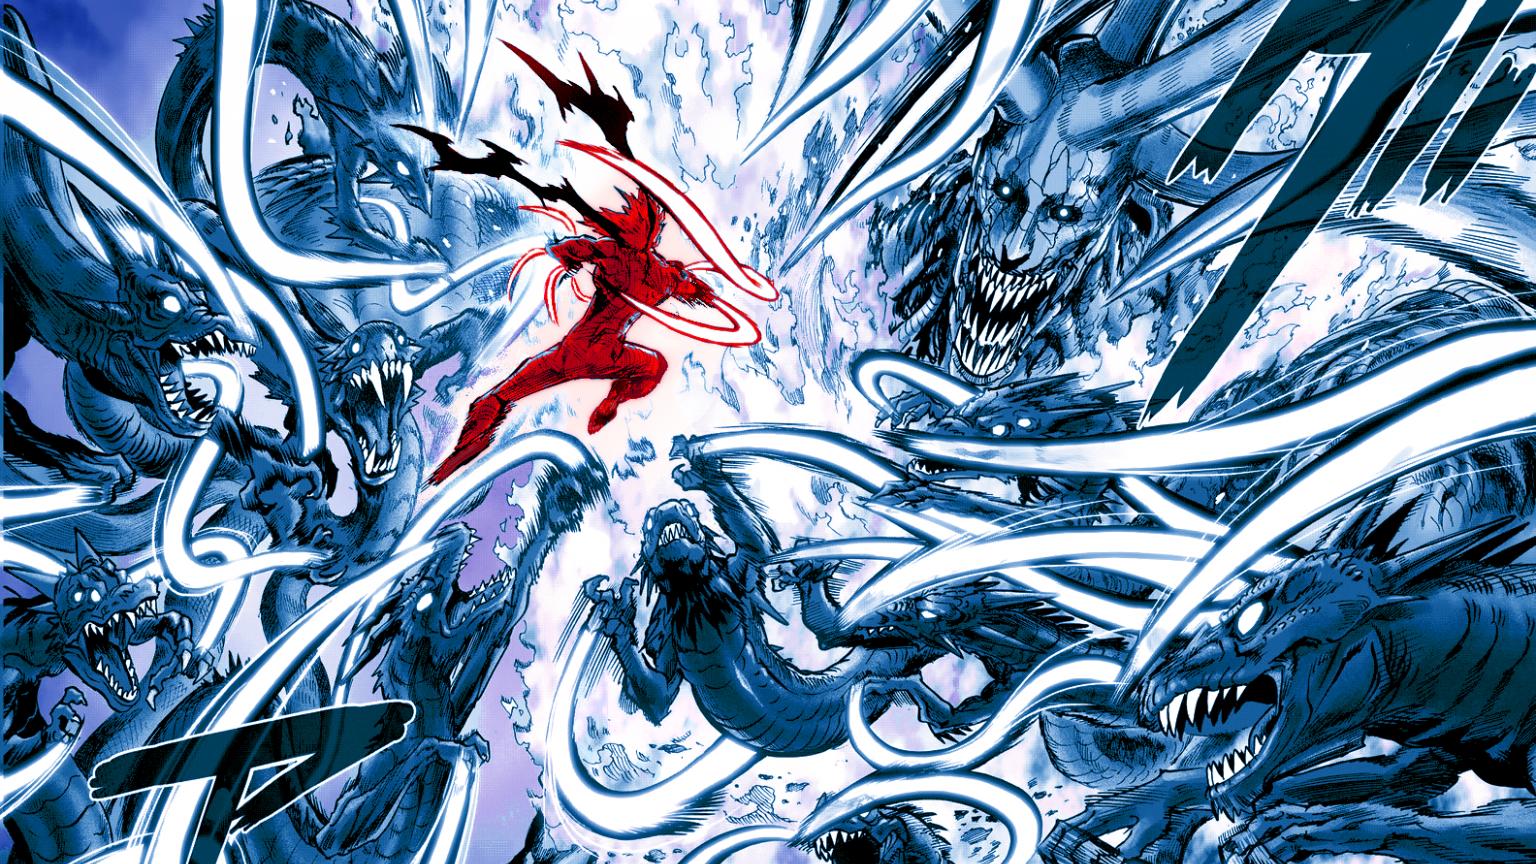 Free Download Made A Garou Wallpaperver 2 Manga Spoilers